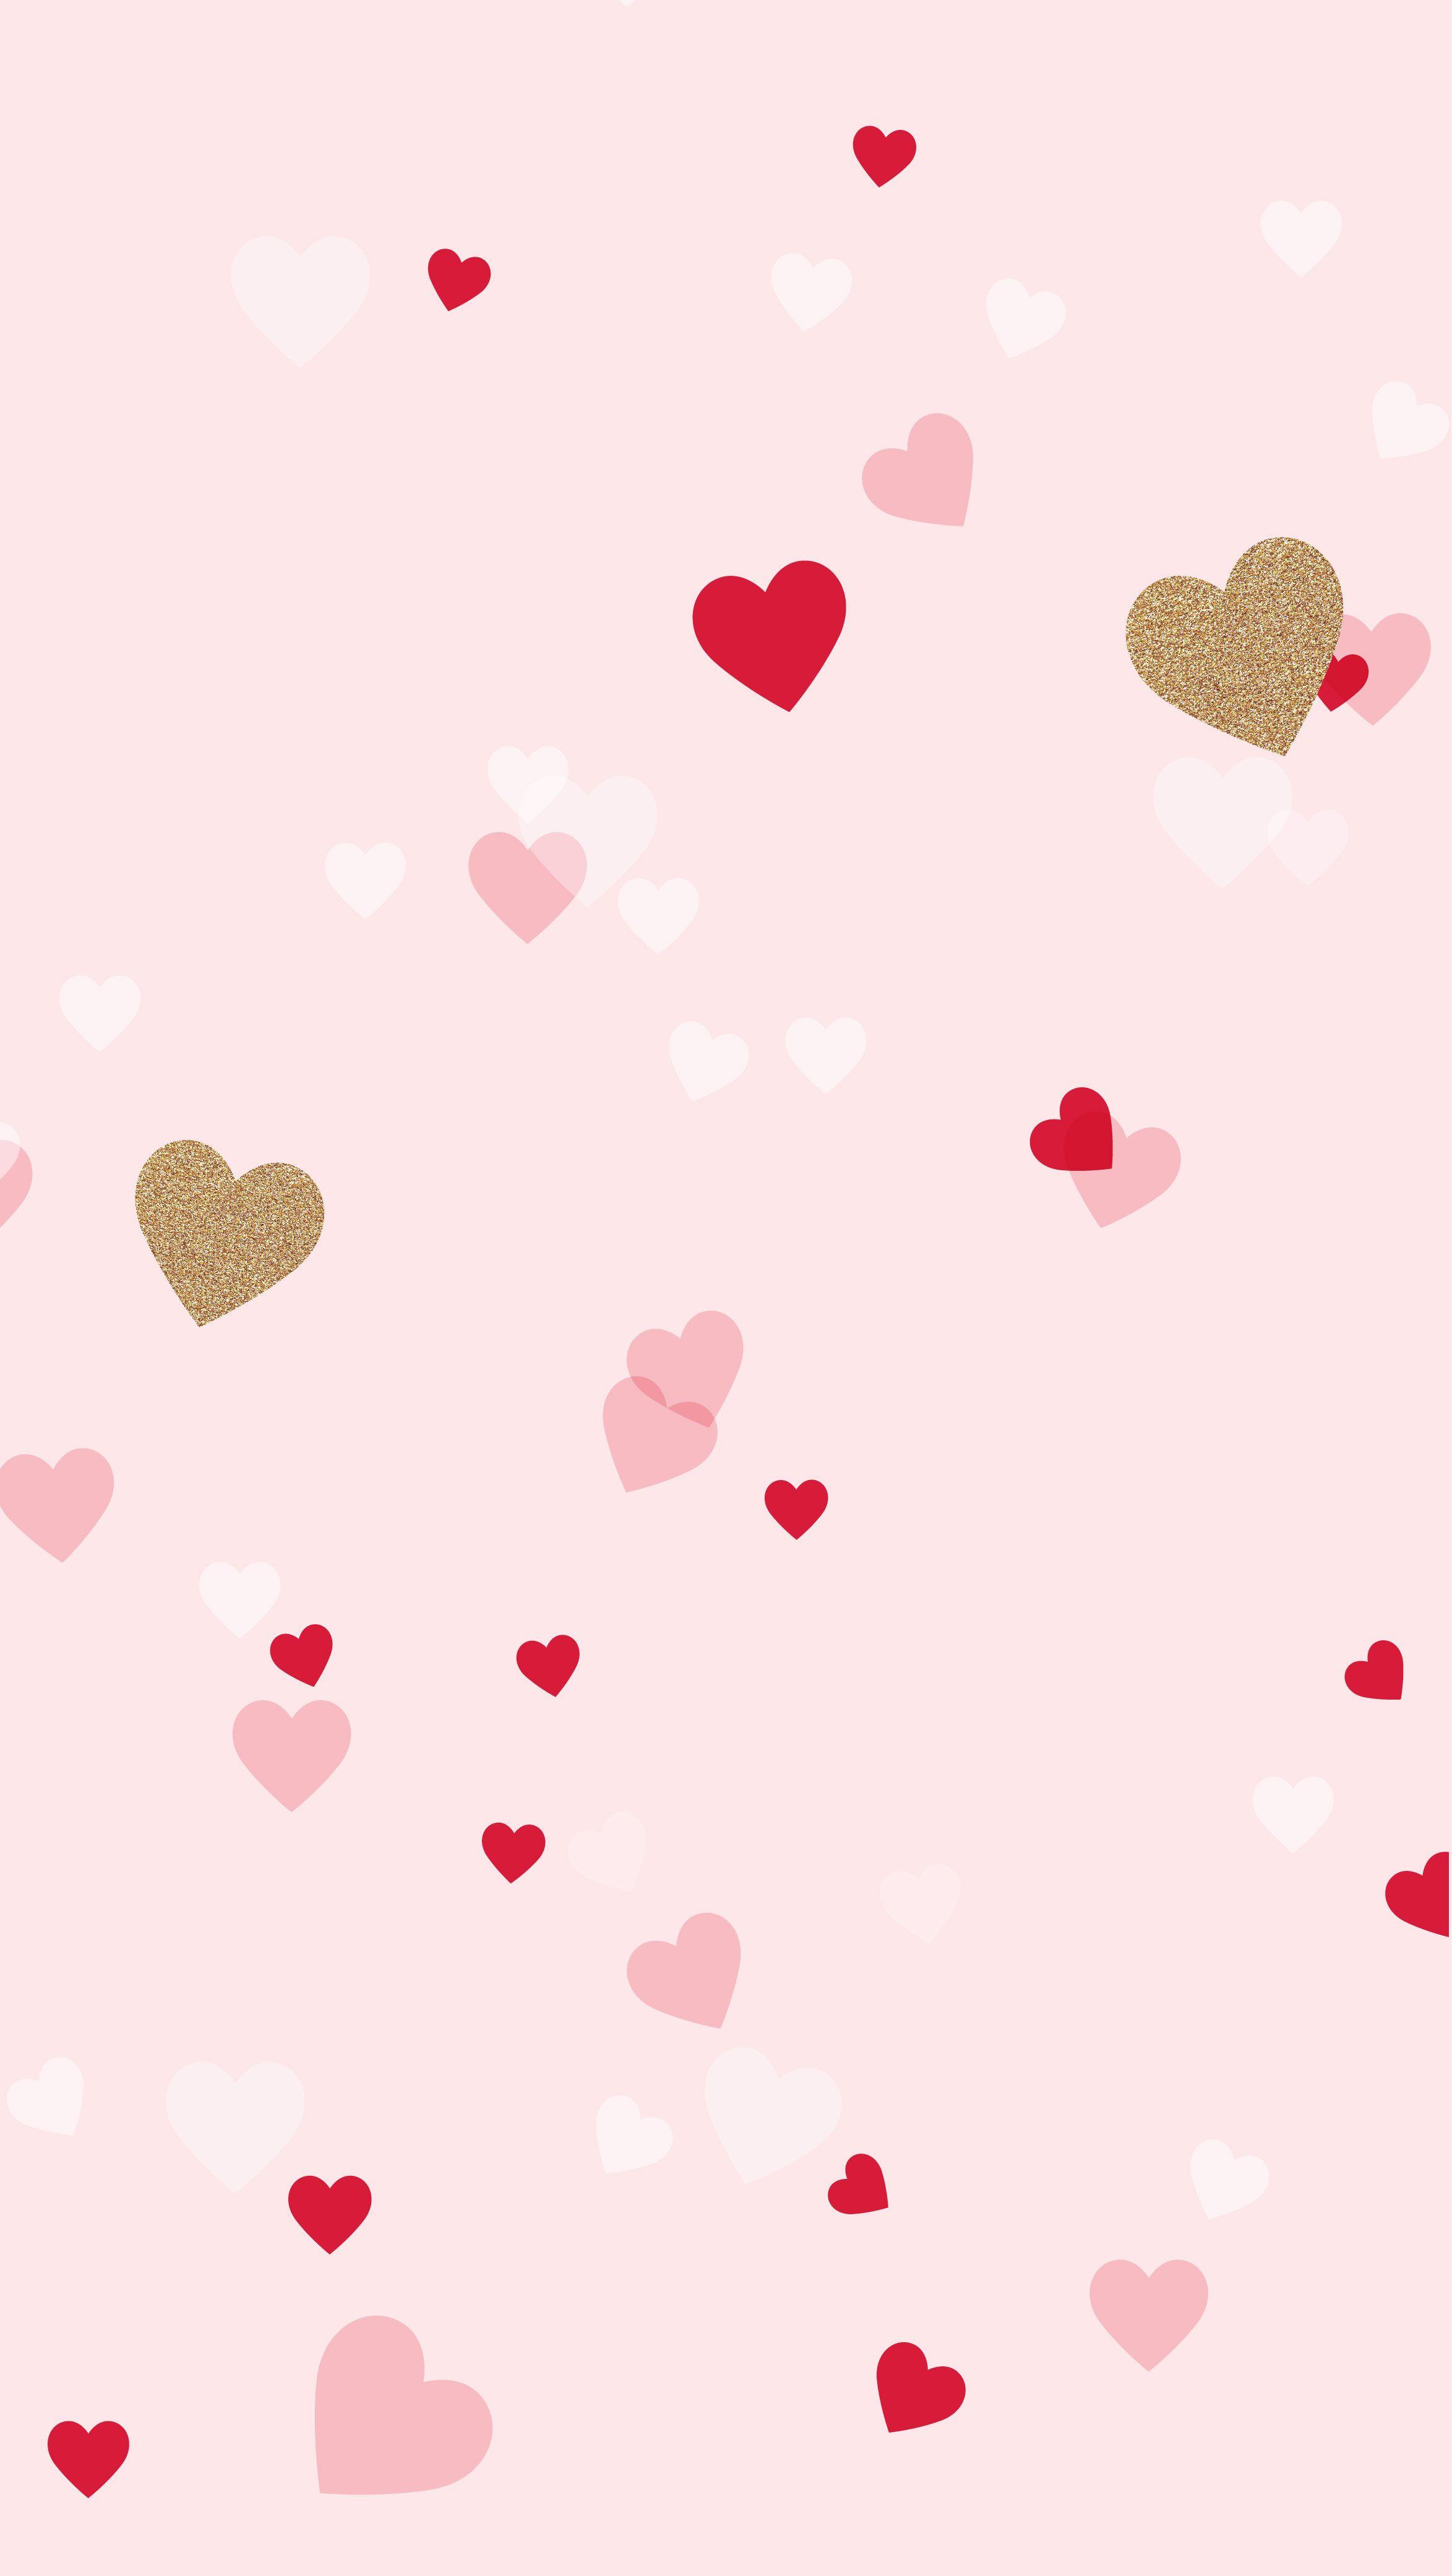 Top Wallpaper Love Iphone 4s - 6b29b837c2309cfe5429e0d89d220b23  Best Photo Reference_32072.jpg